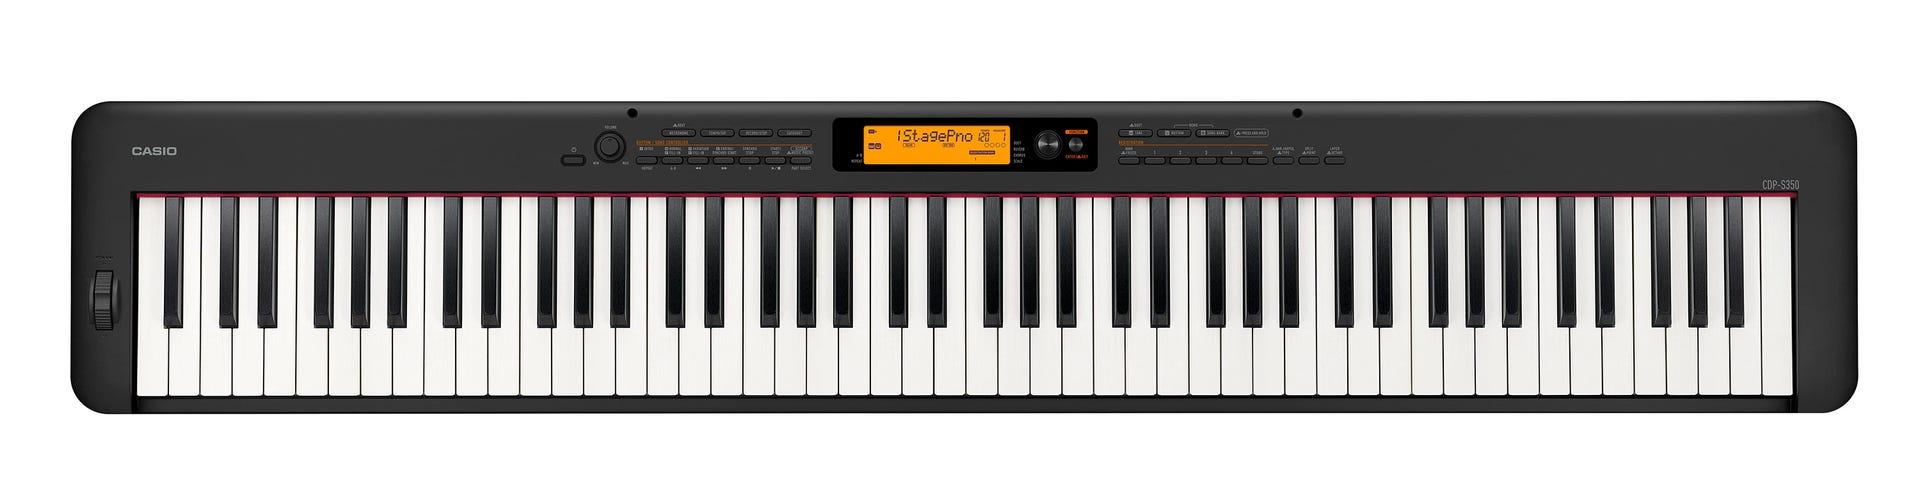 Casio CDP-S350 Digital Piano - Black